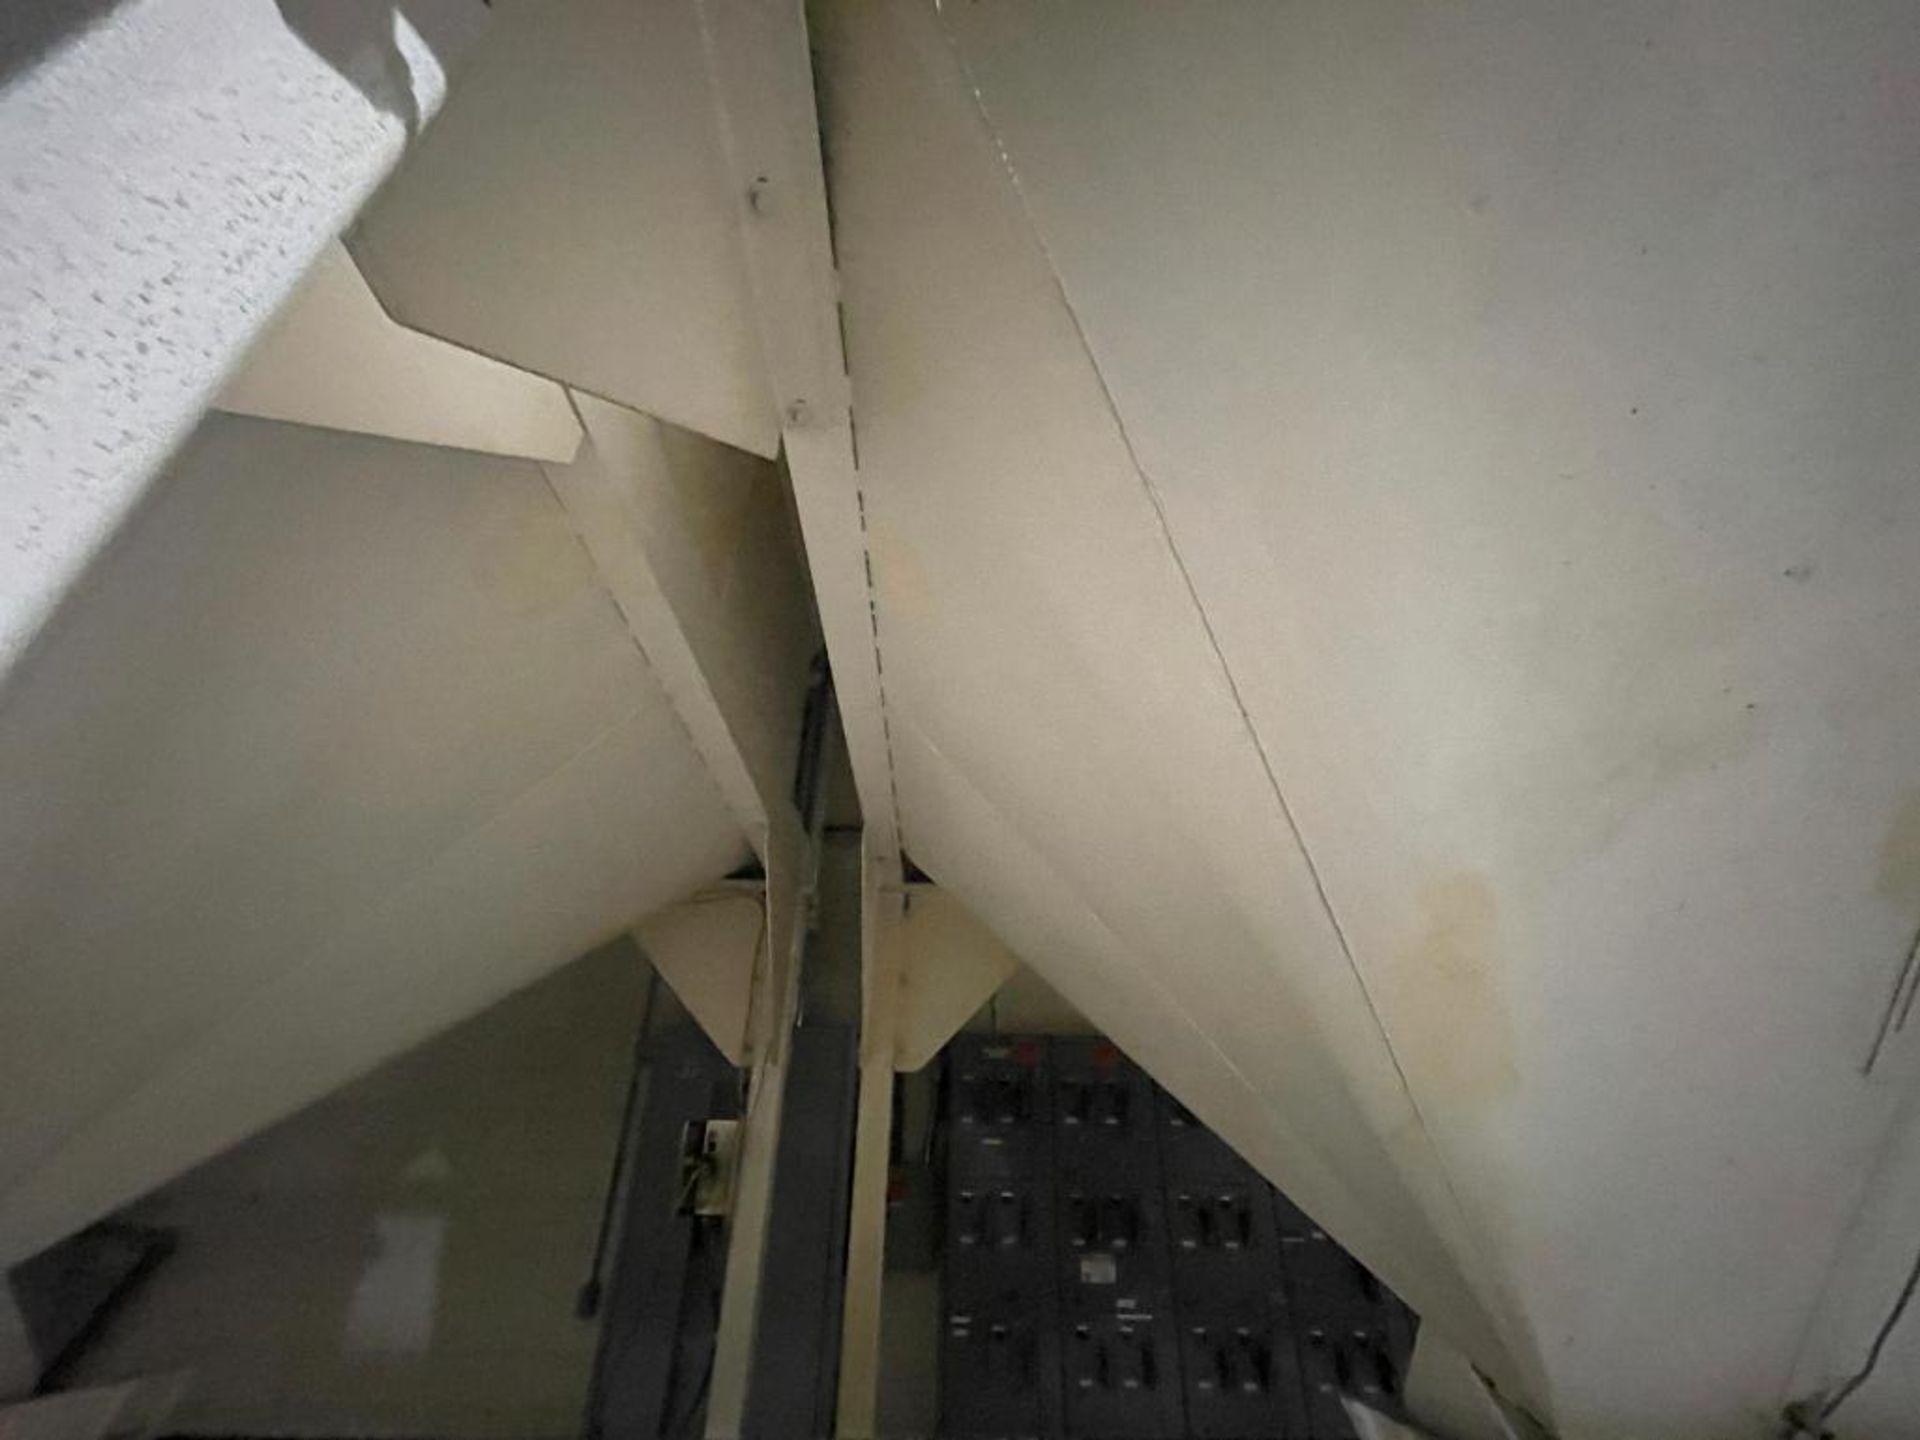 Aseeco mild steel cone bottom bulk storage bin - Image 9 of 31